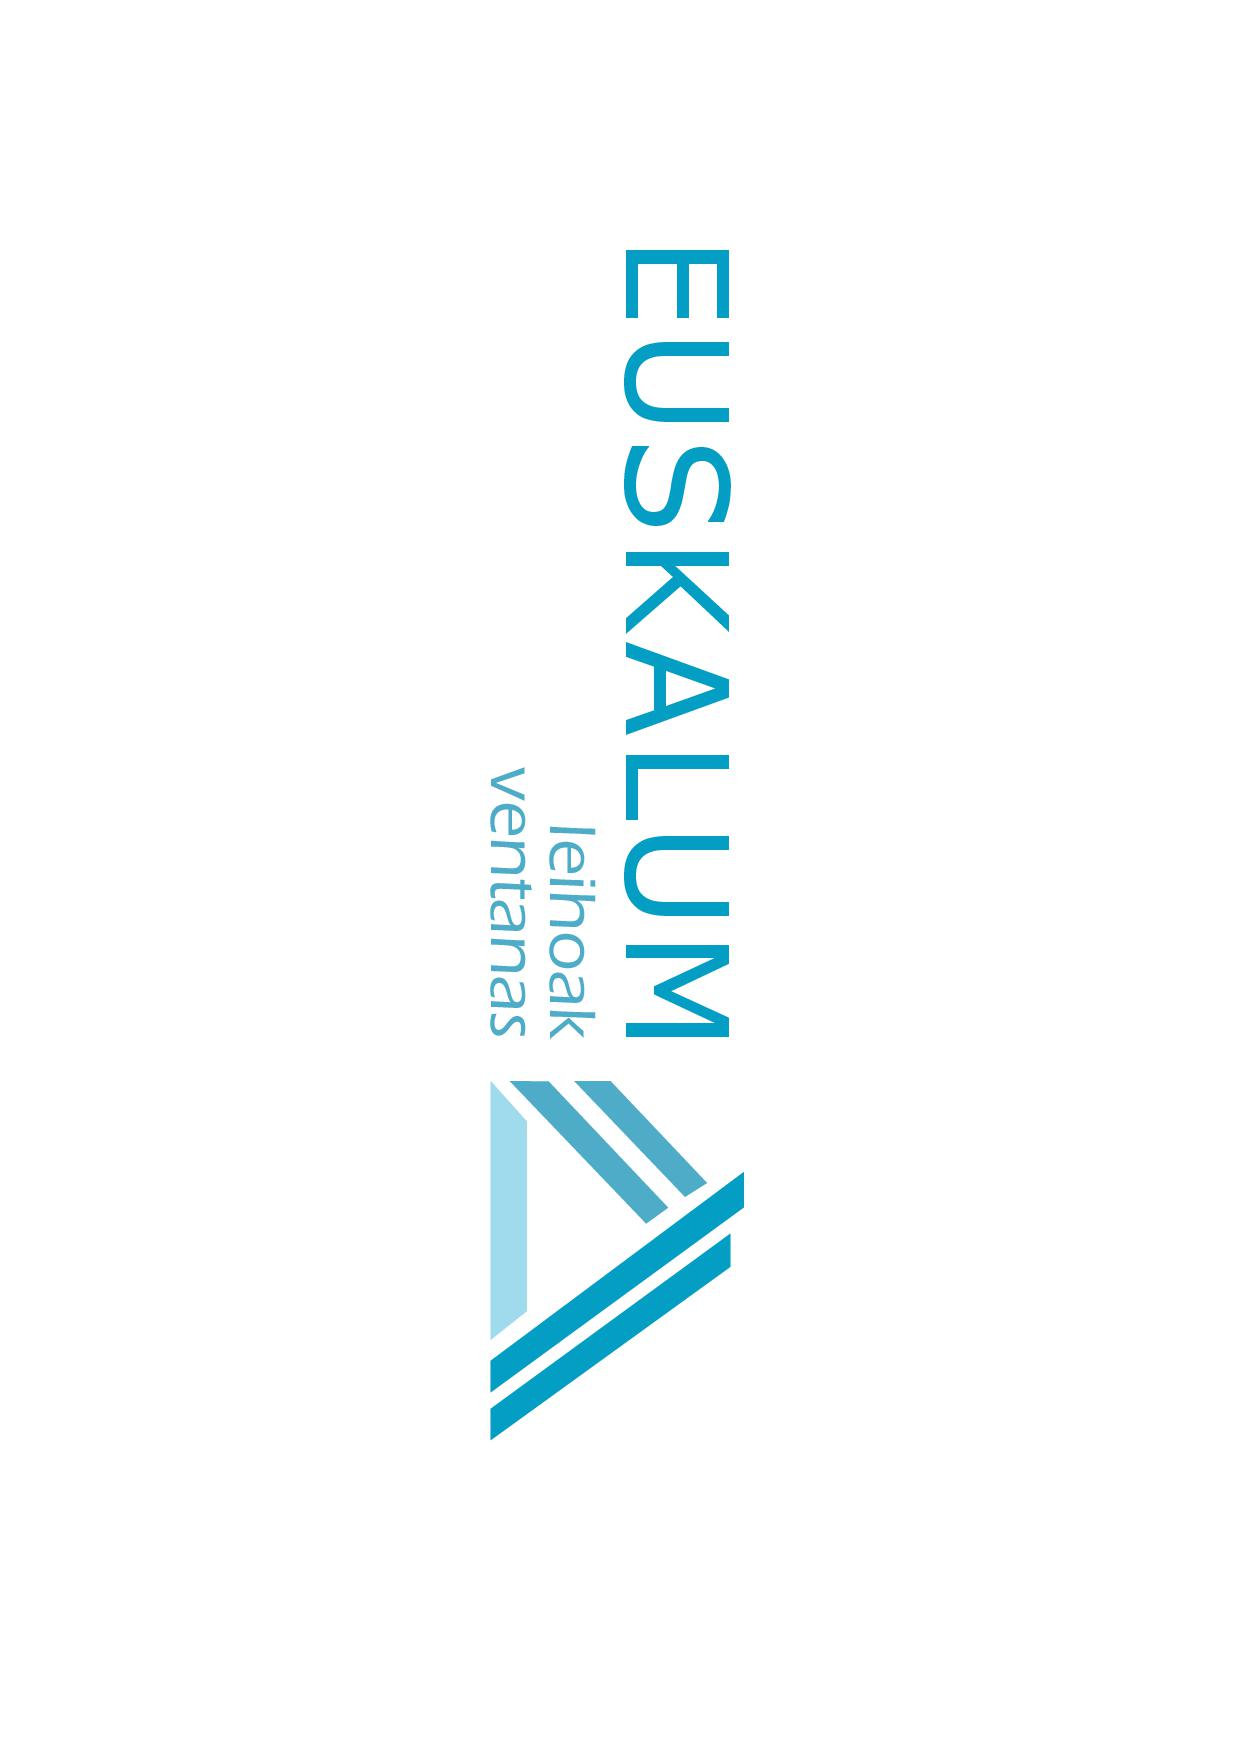 Euskalum